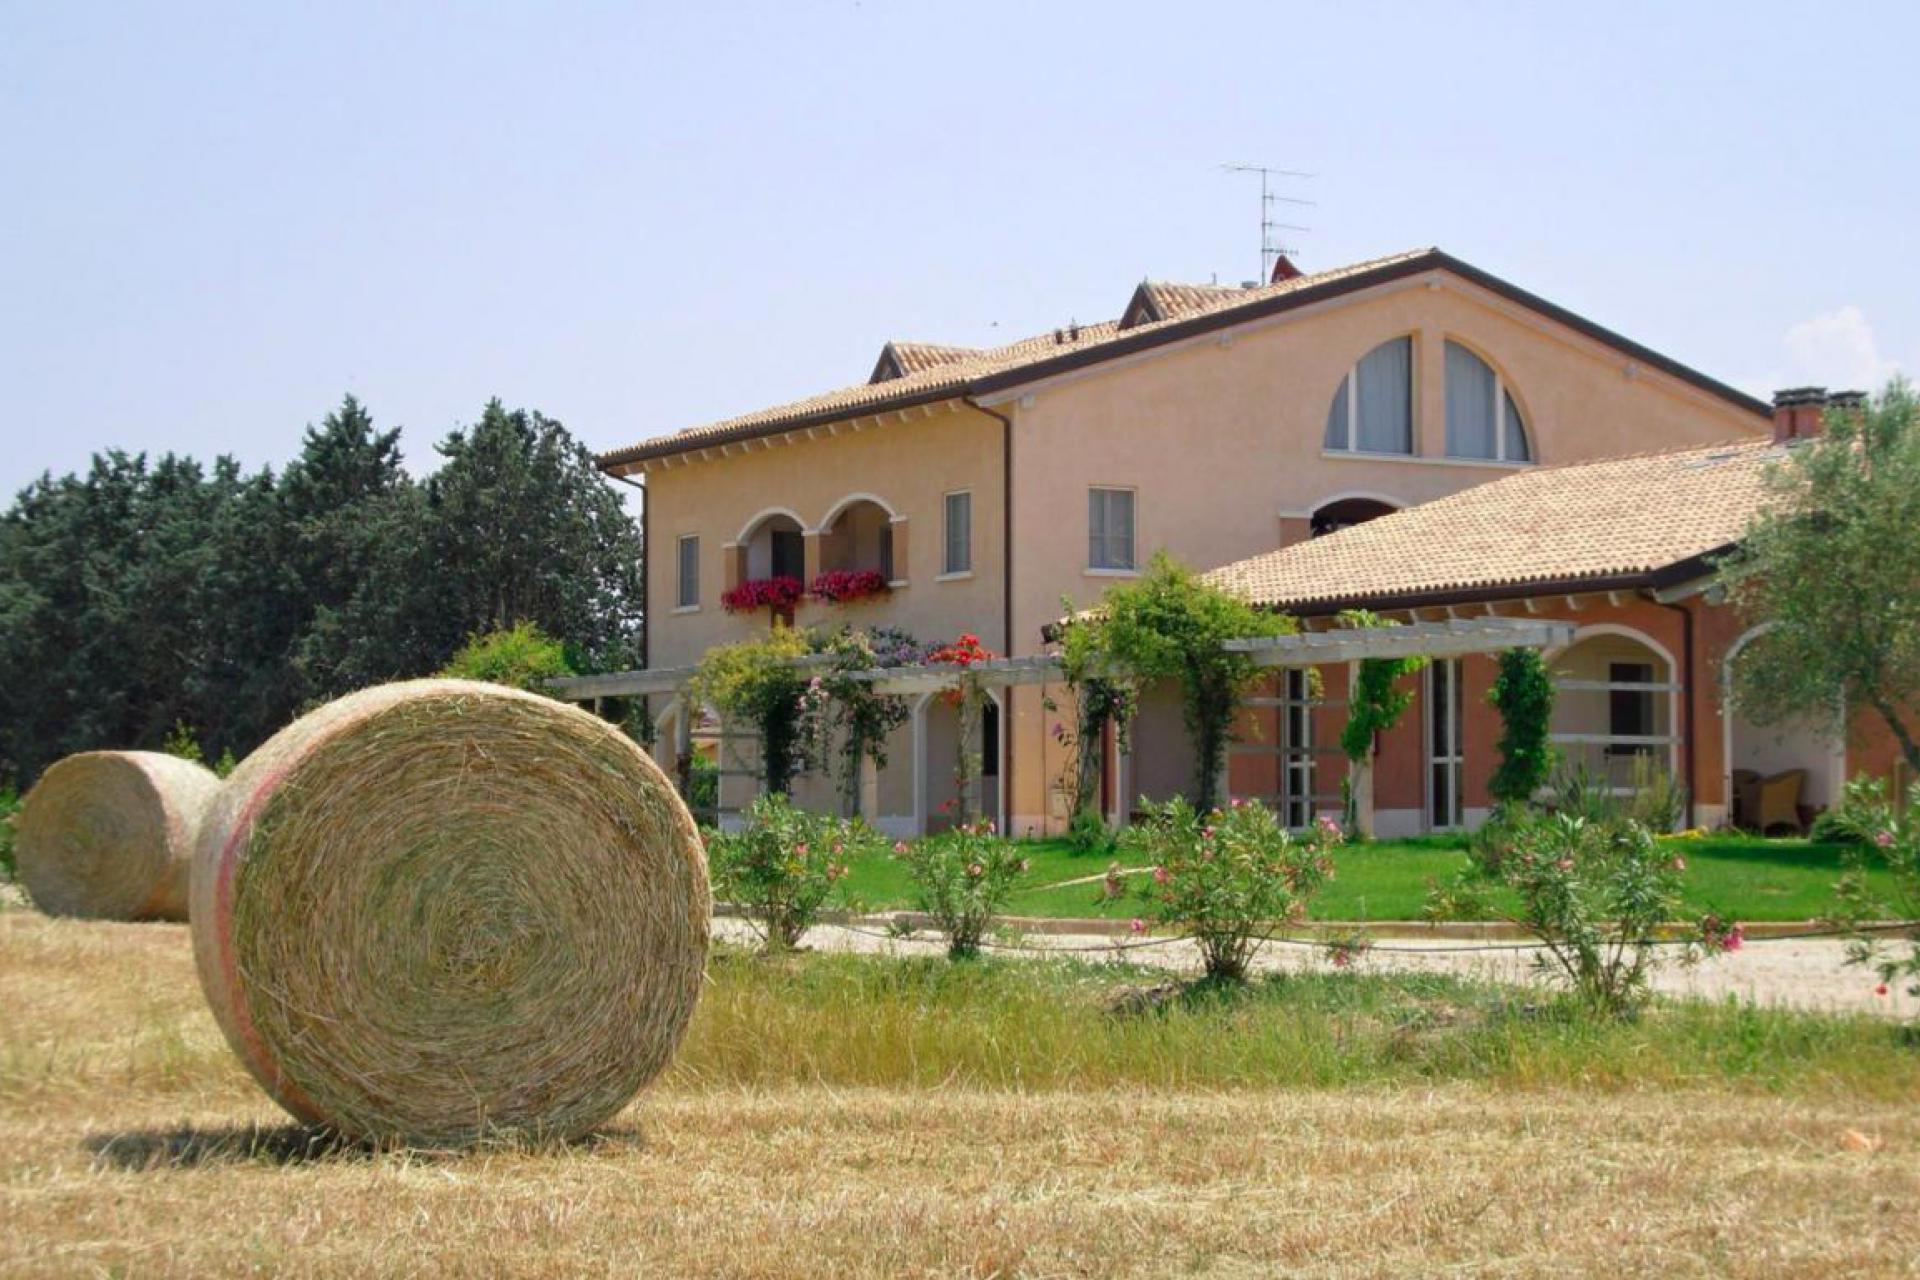 Agriturismo Tuscany Luxury agriturismo in Tuscany near the beach